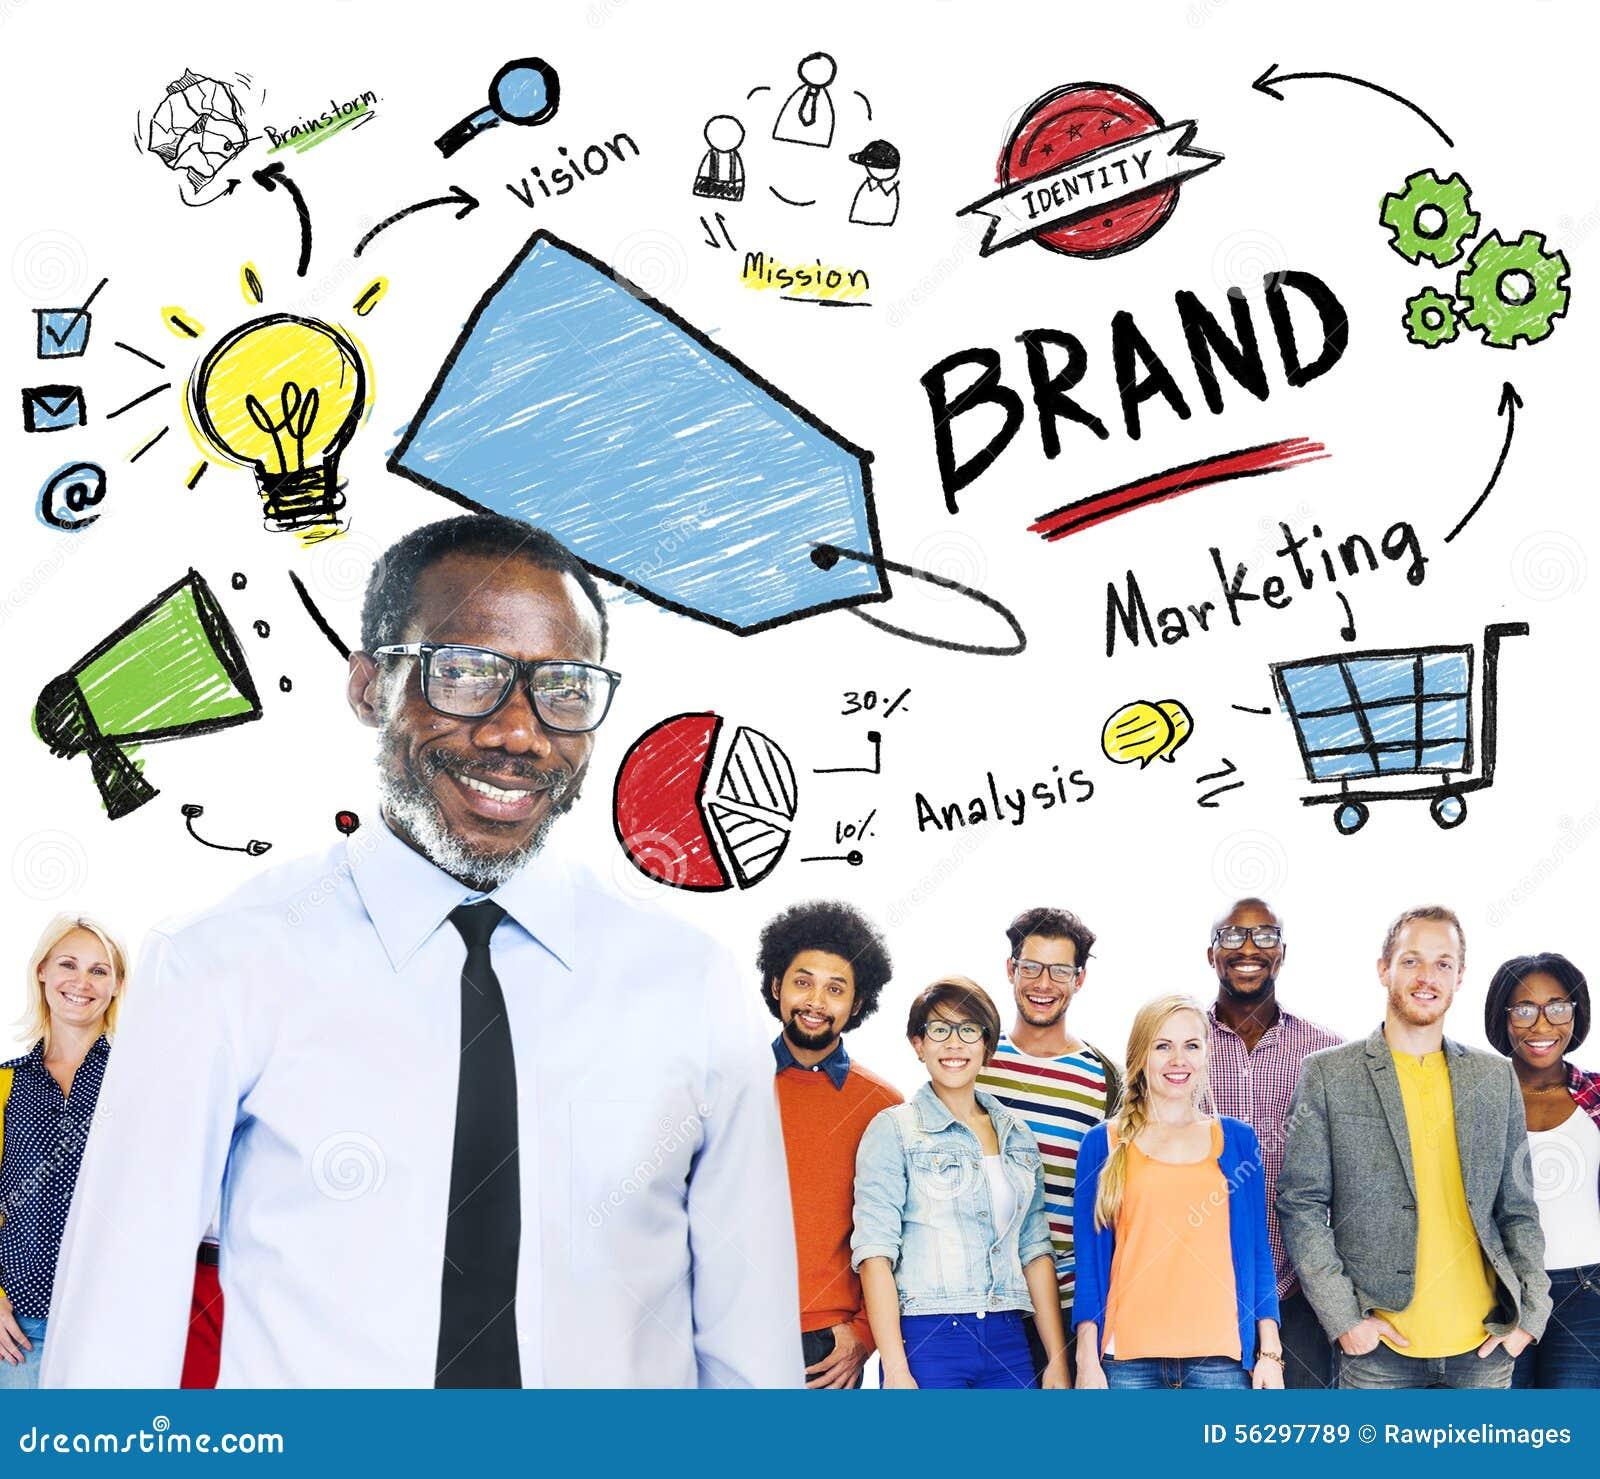 BAND ENGAGE | Marketing. Branding. Vision.